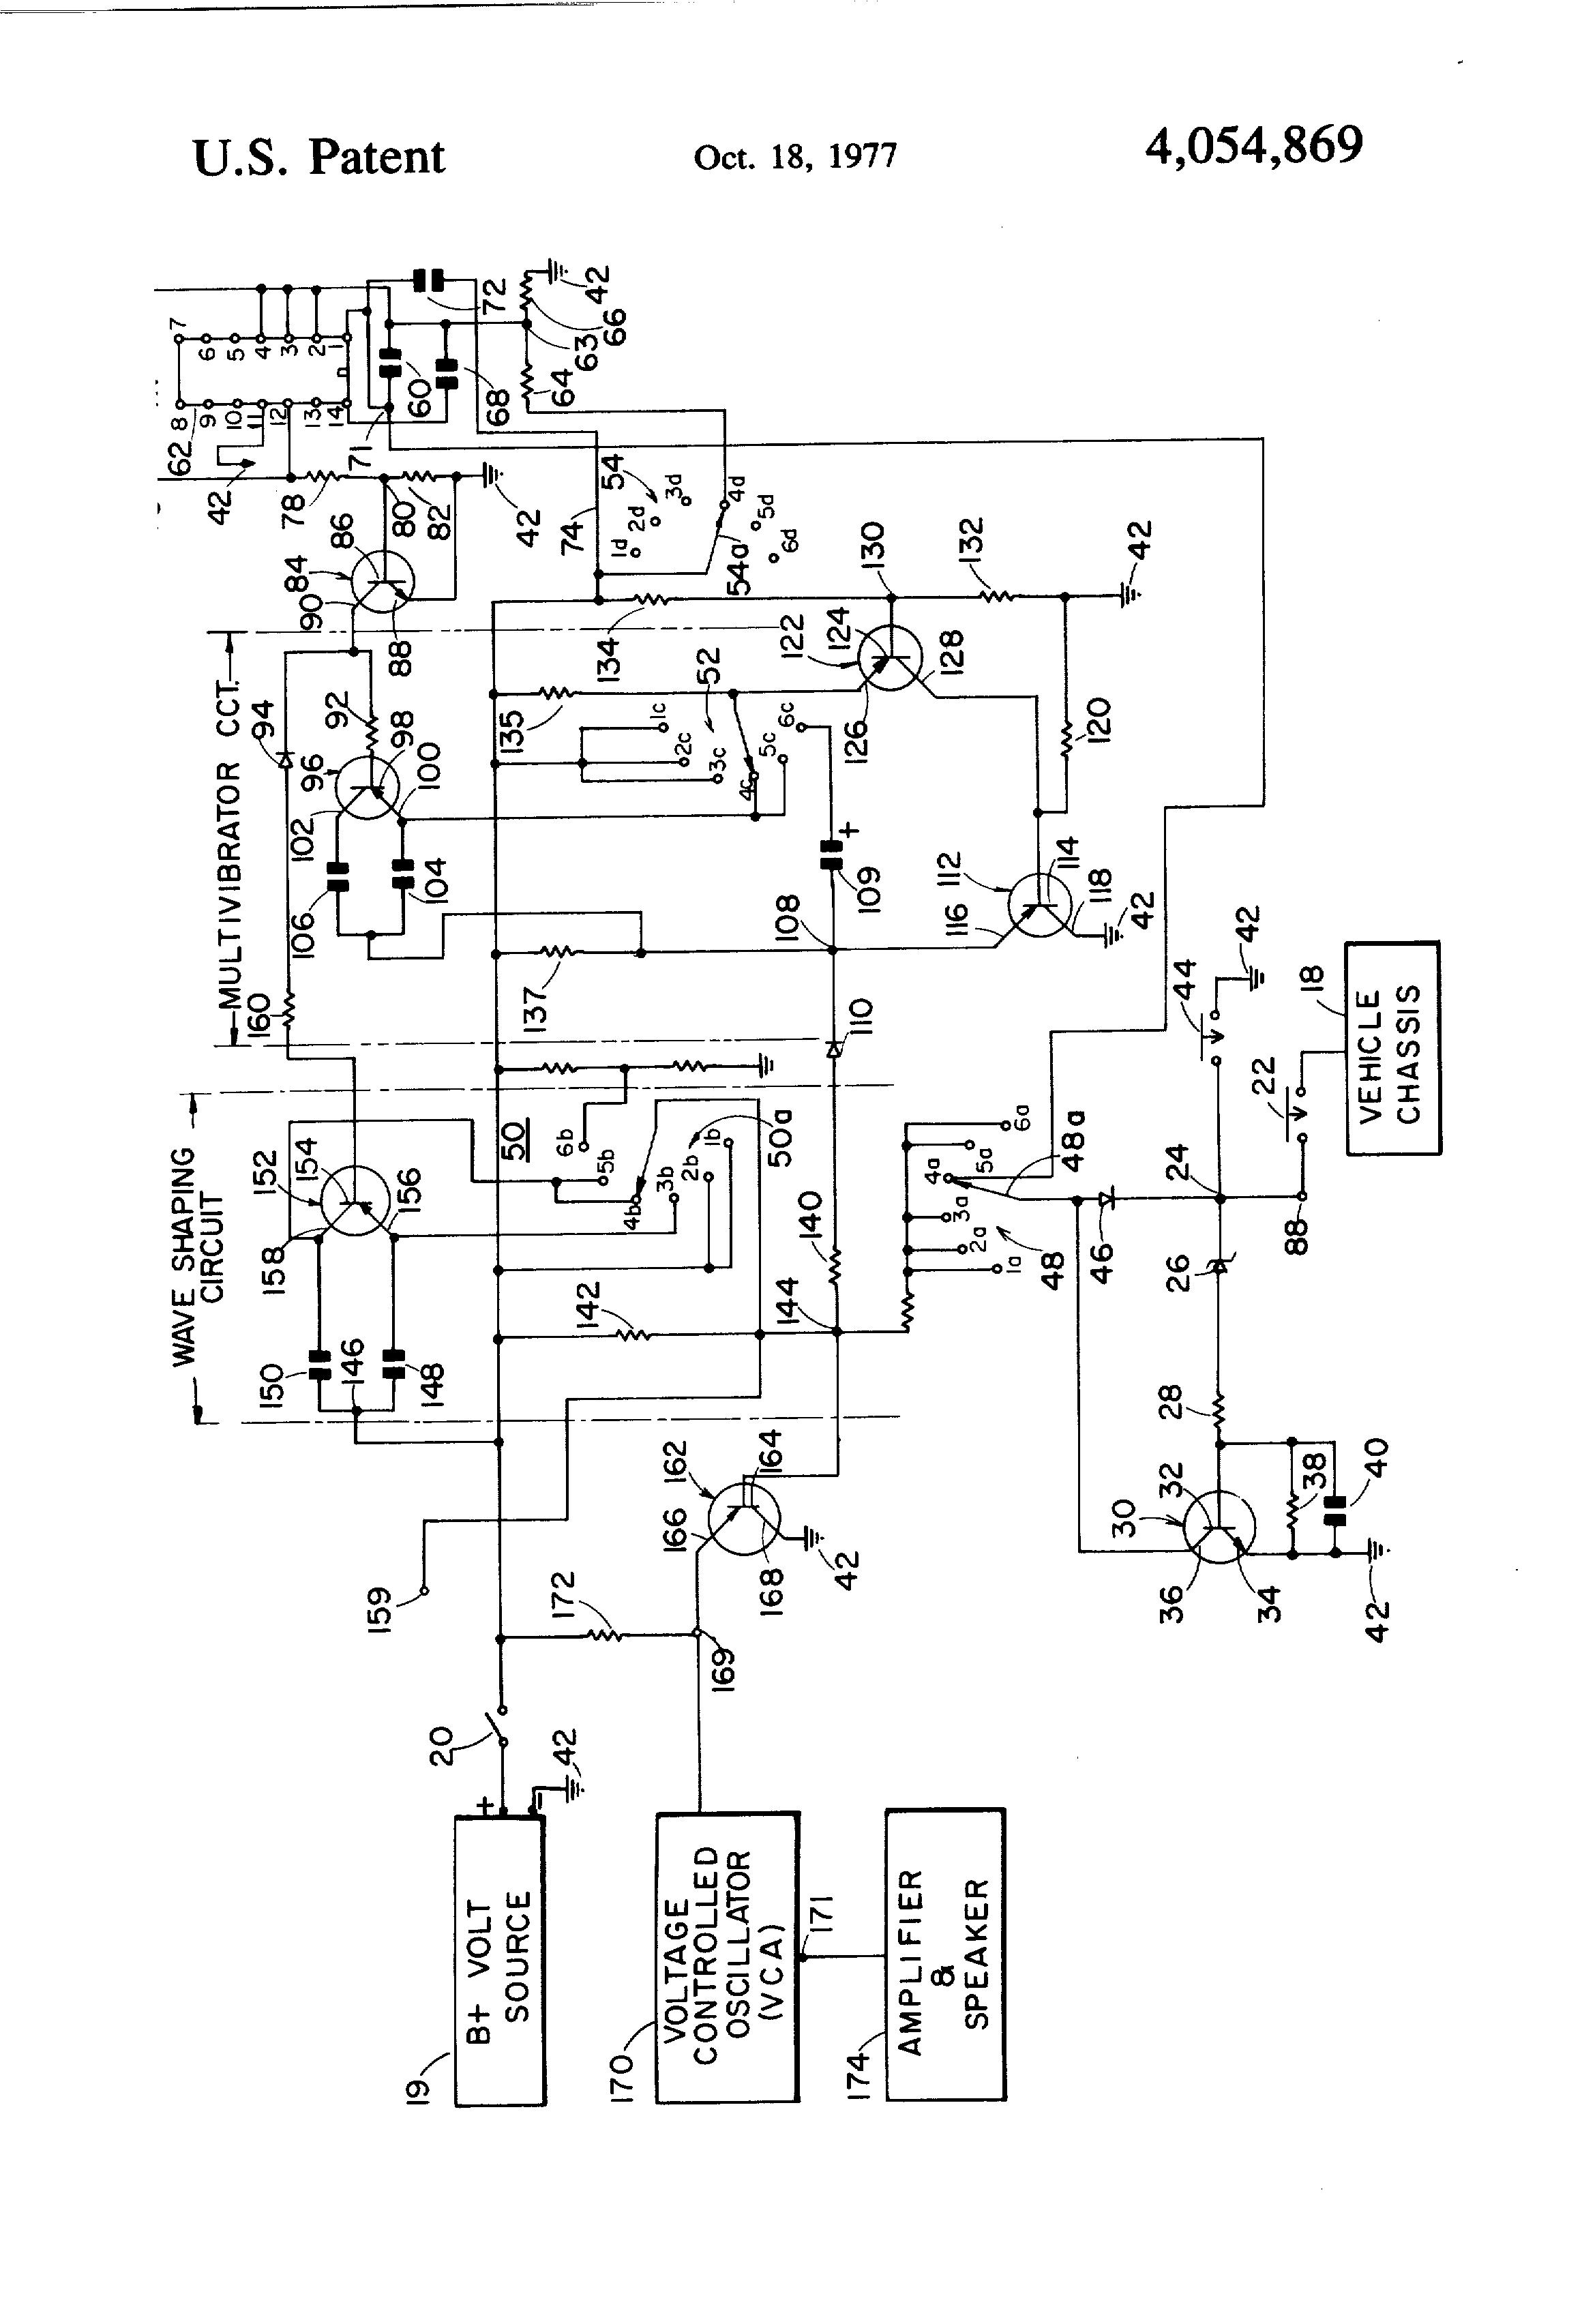 Cool Wiring Co Vu Auto Electrical Wiring Diagram Wiring Cloud Intelaidewilluminateatxorg